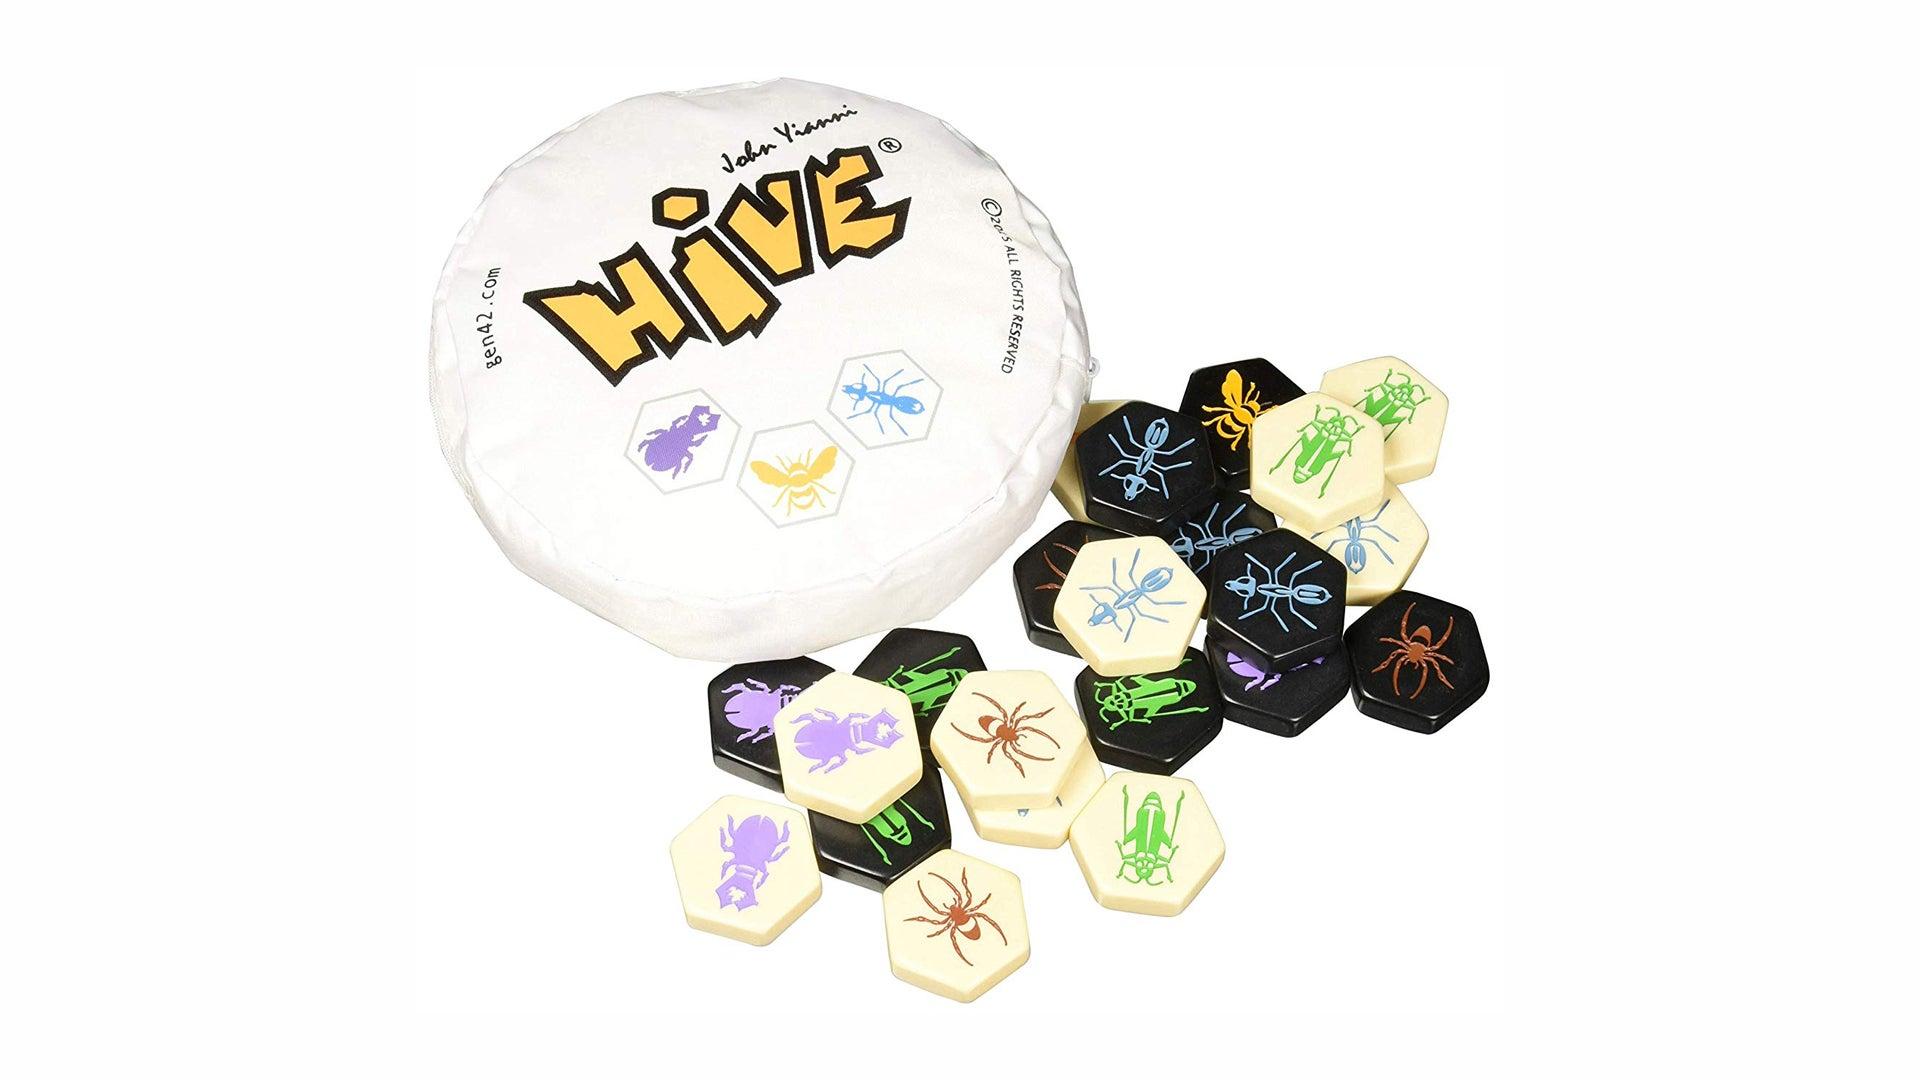 Hive board game box